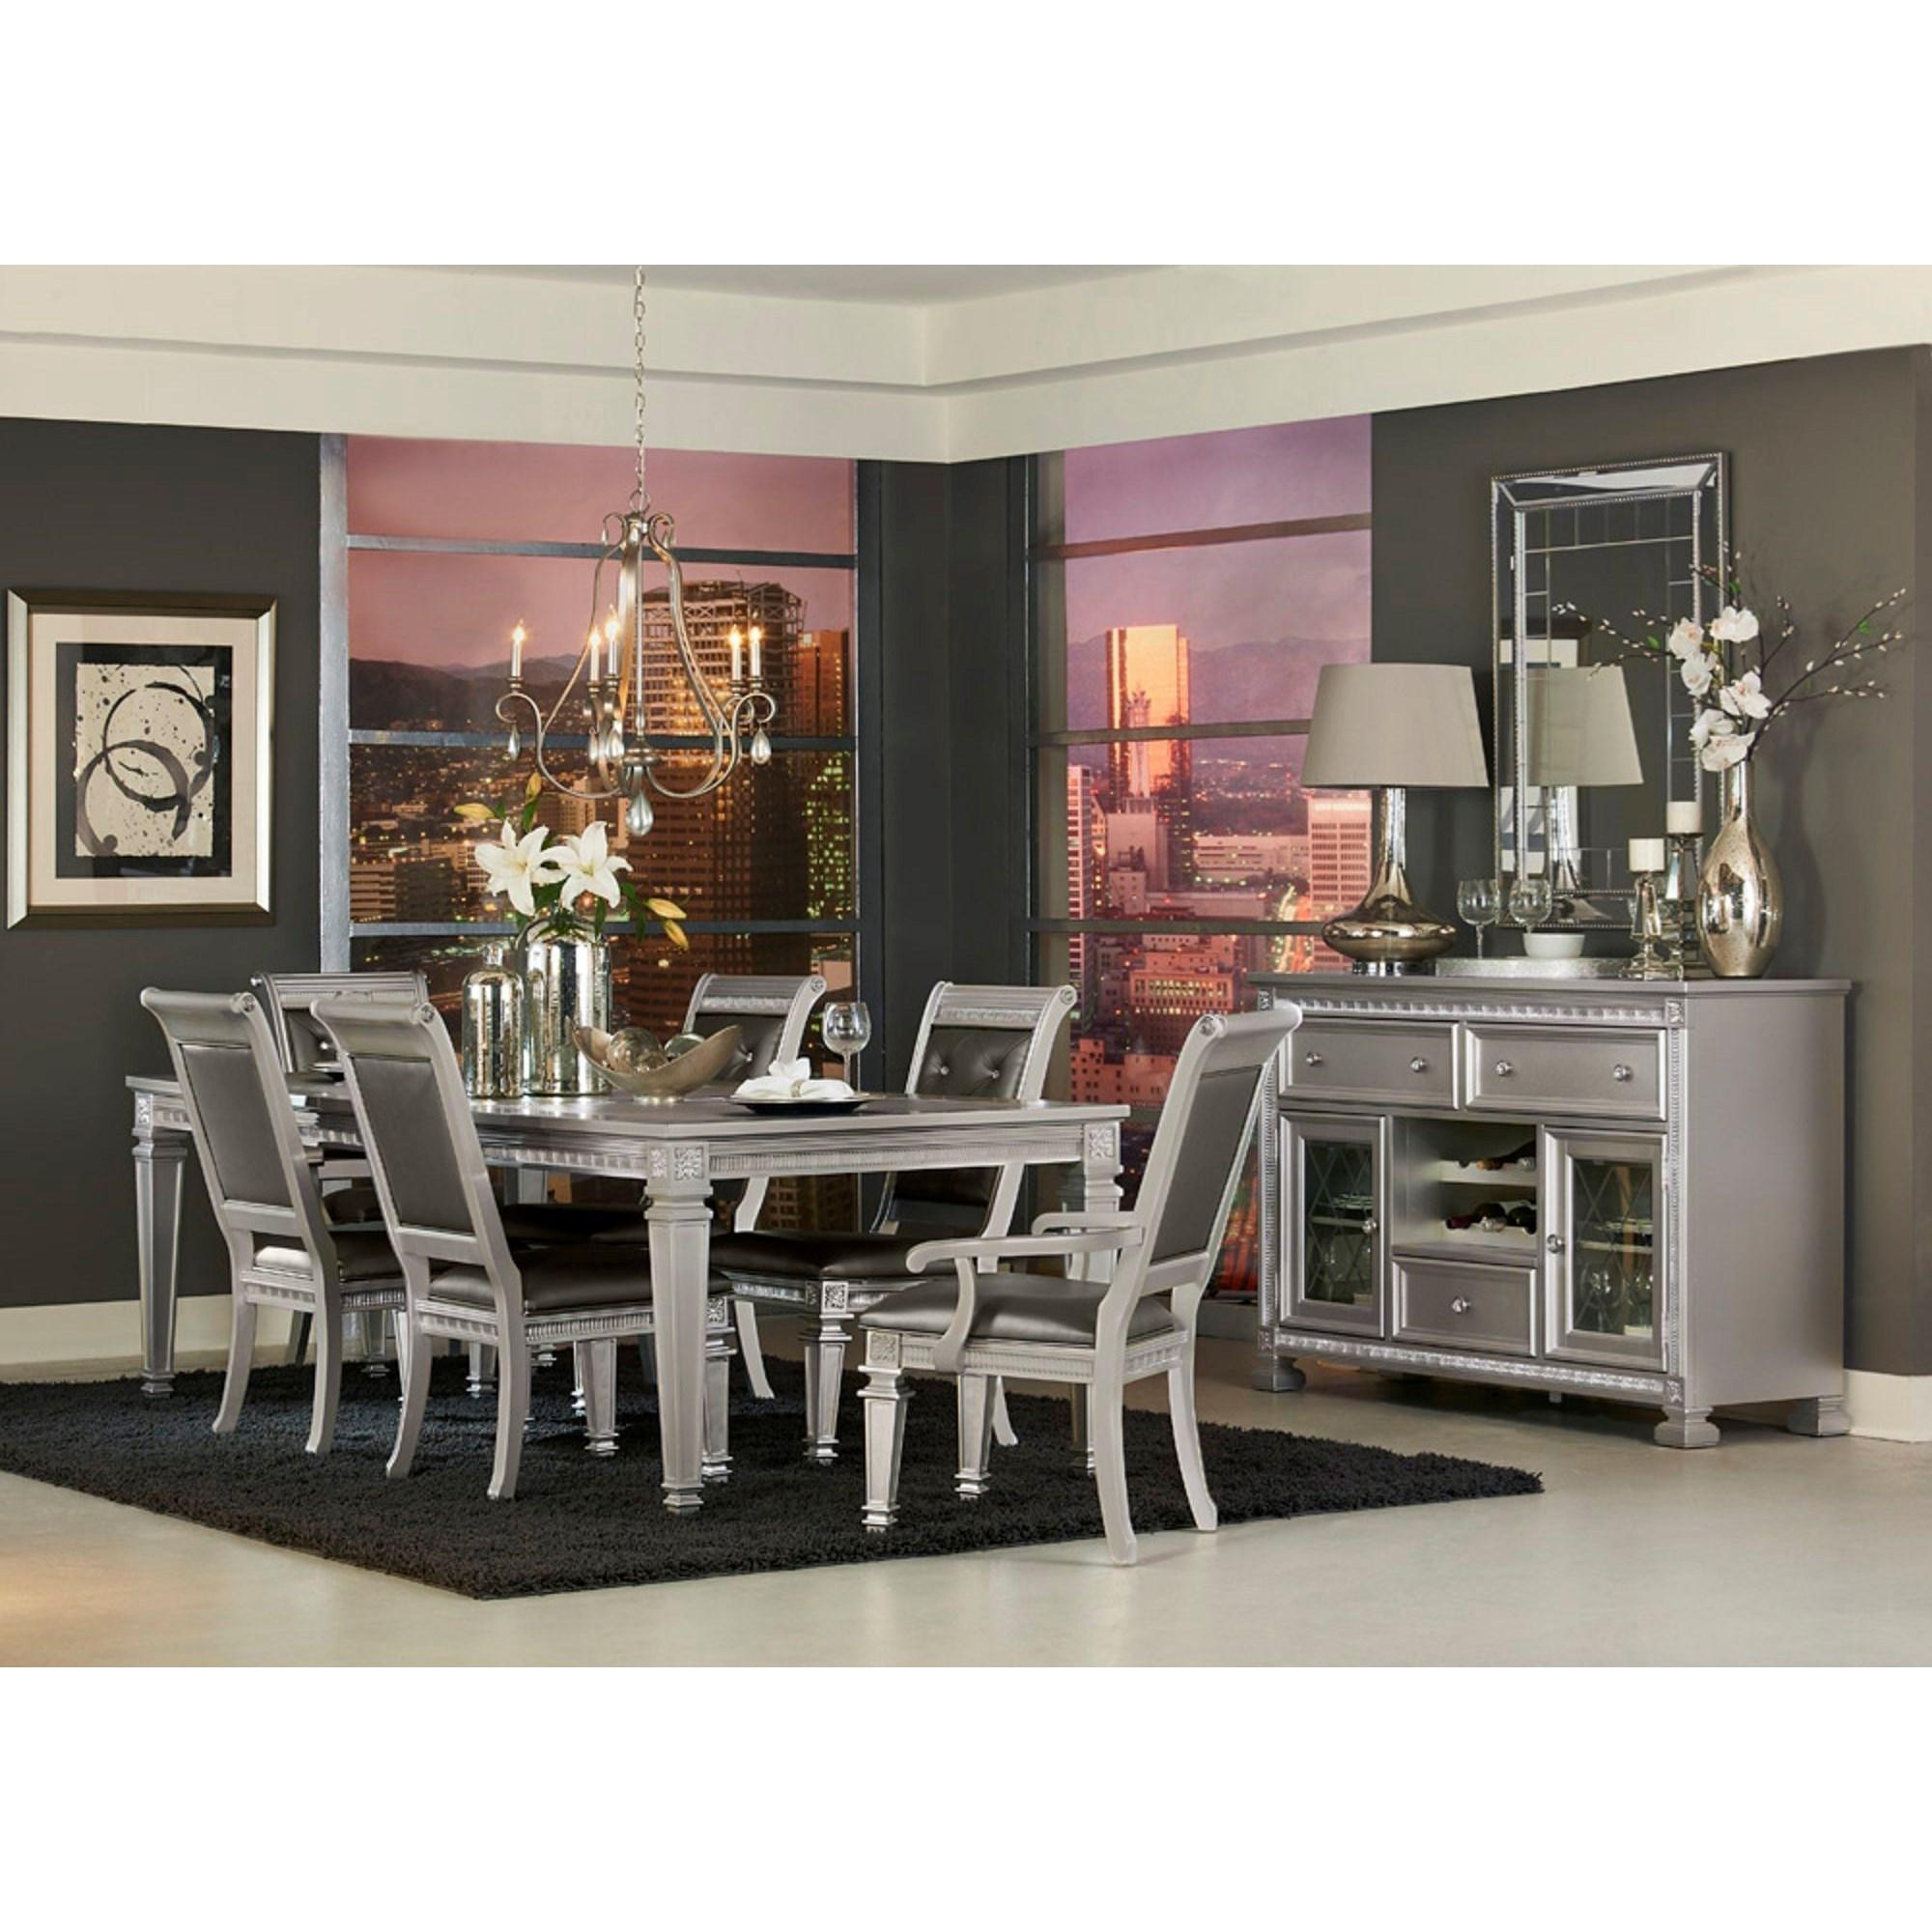 1958 Glam Dining Room Group by Homelegance Furniture at Del Sol Furniture